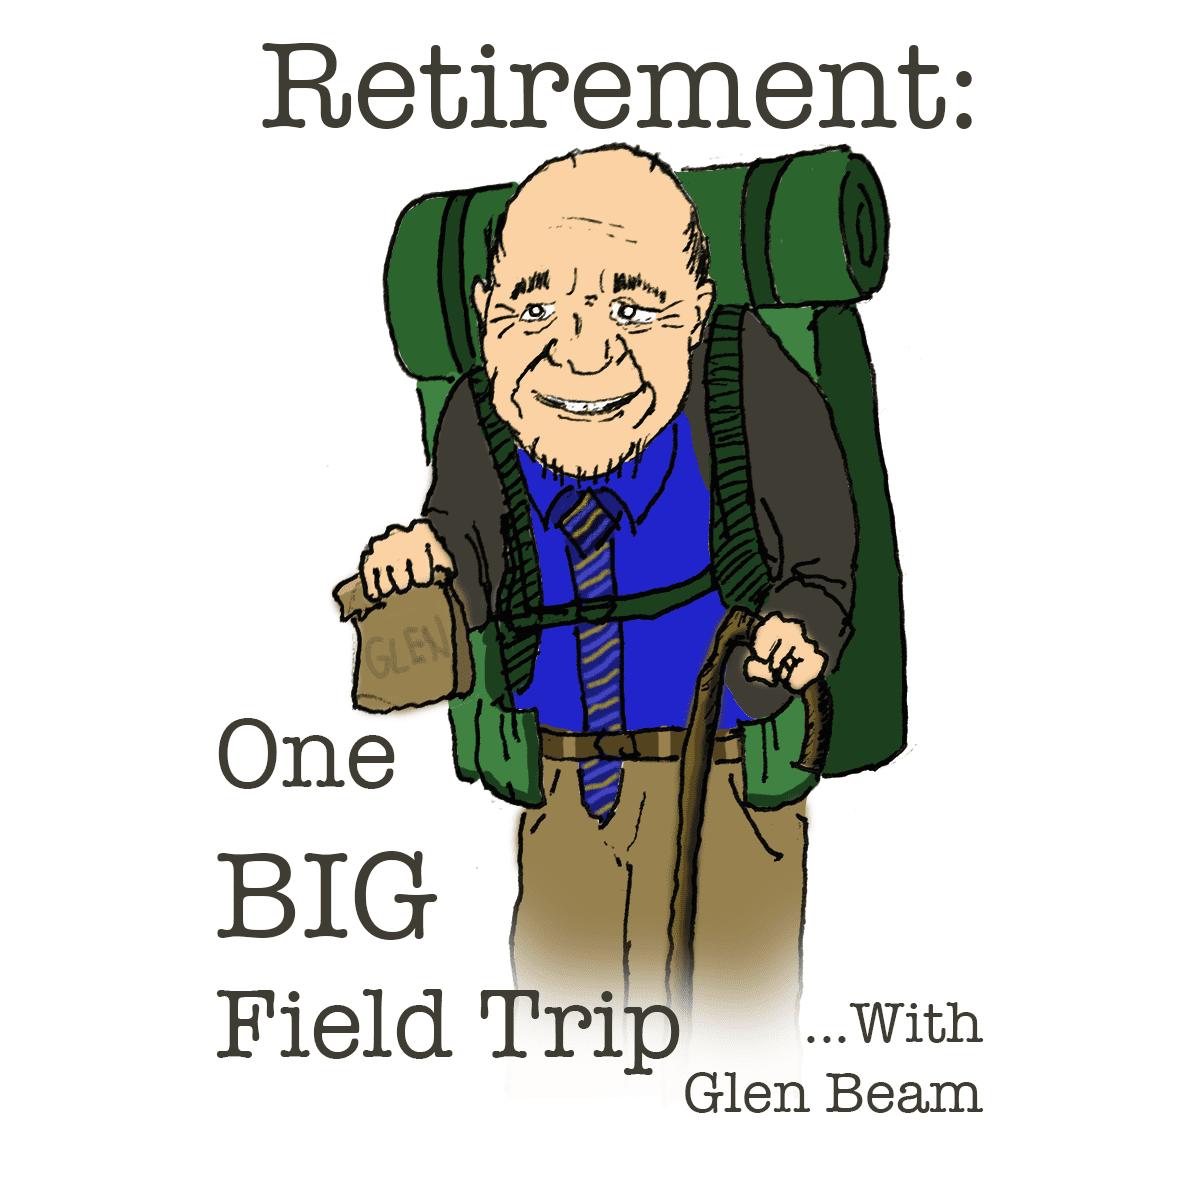 Retirement: One BIG Field Trip With Glen Beam